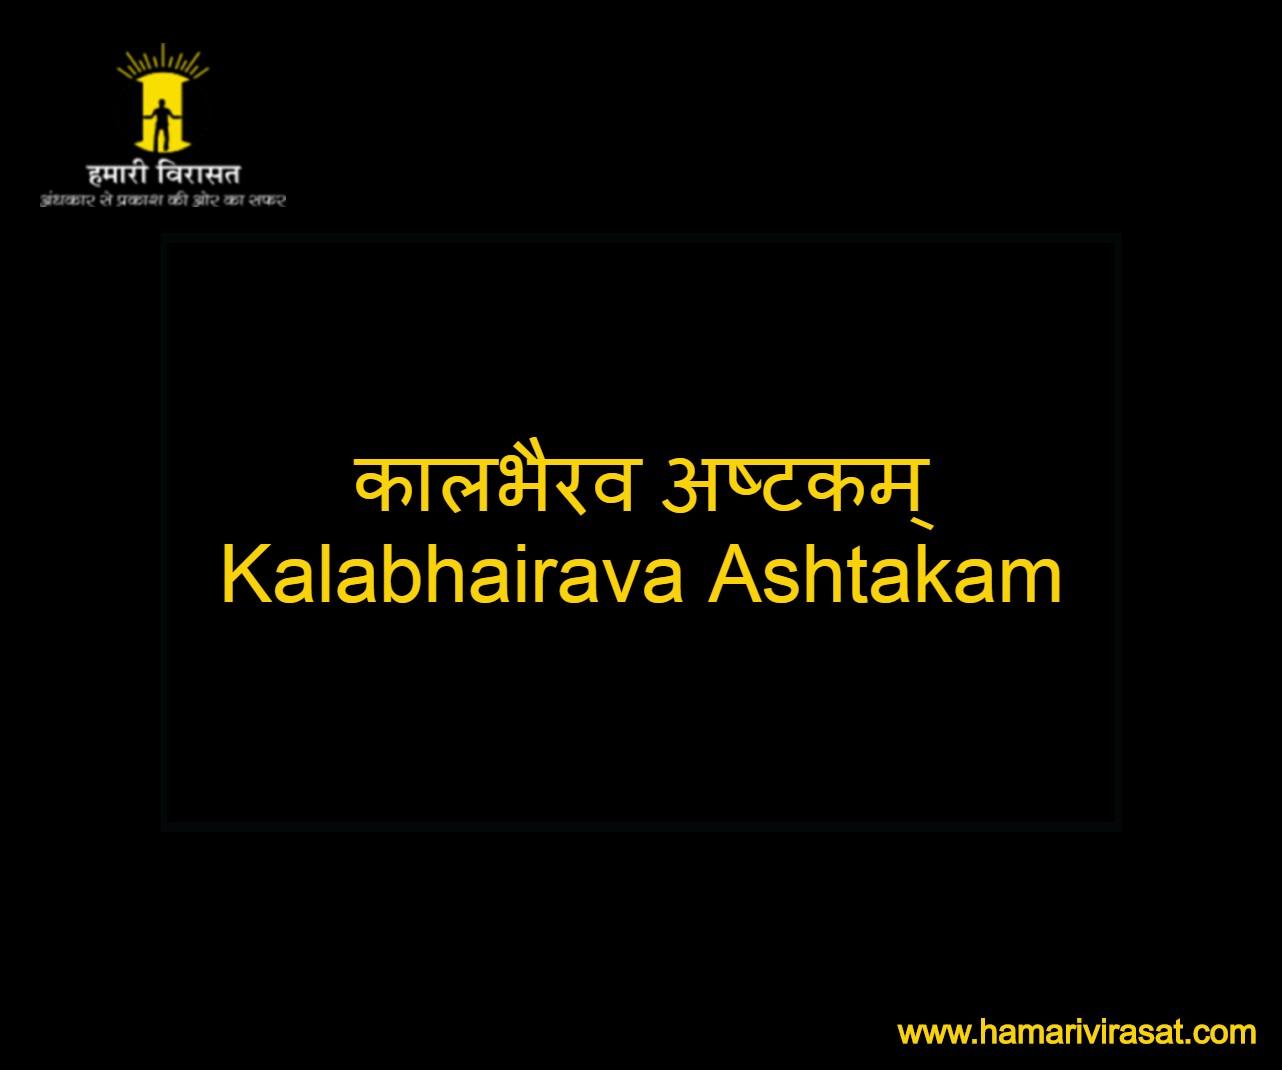 हिंदी अर्थो के साथ पढ़े कालभैरव अष्टकम्(Kalabhairava Ashtakam)